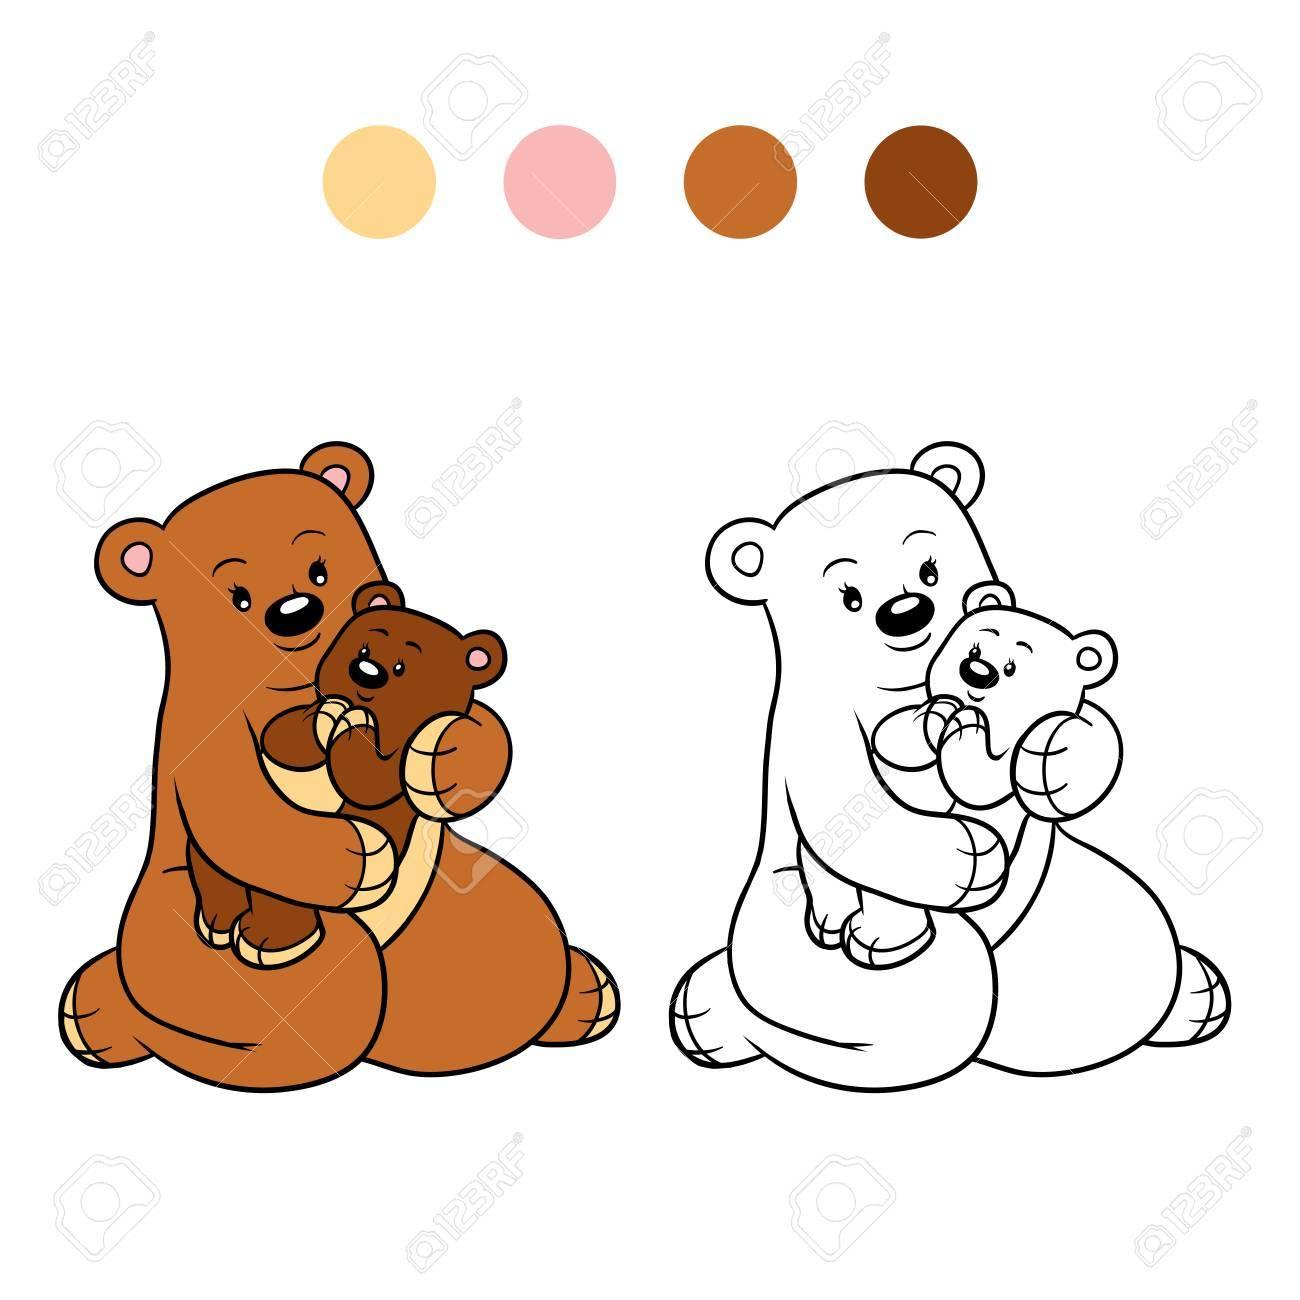 Dibujo Para Colorear Para Niños Familia De Osos